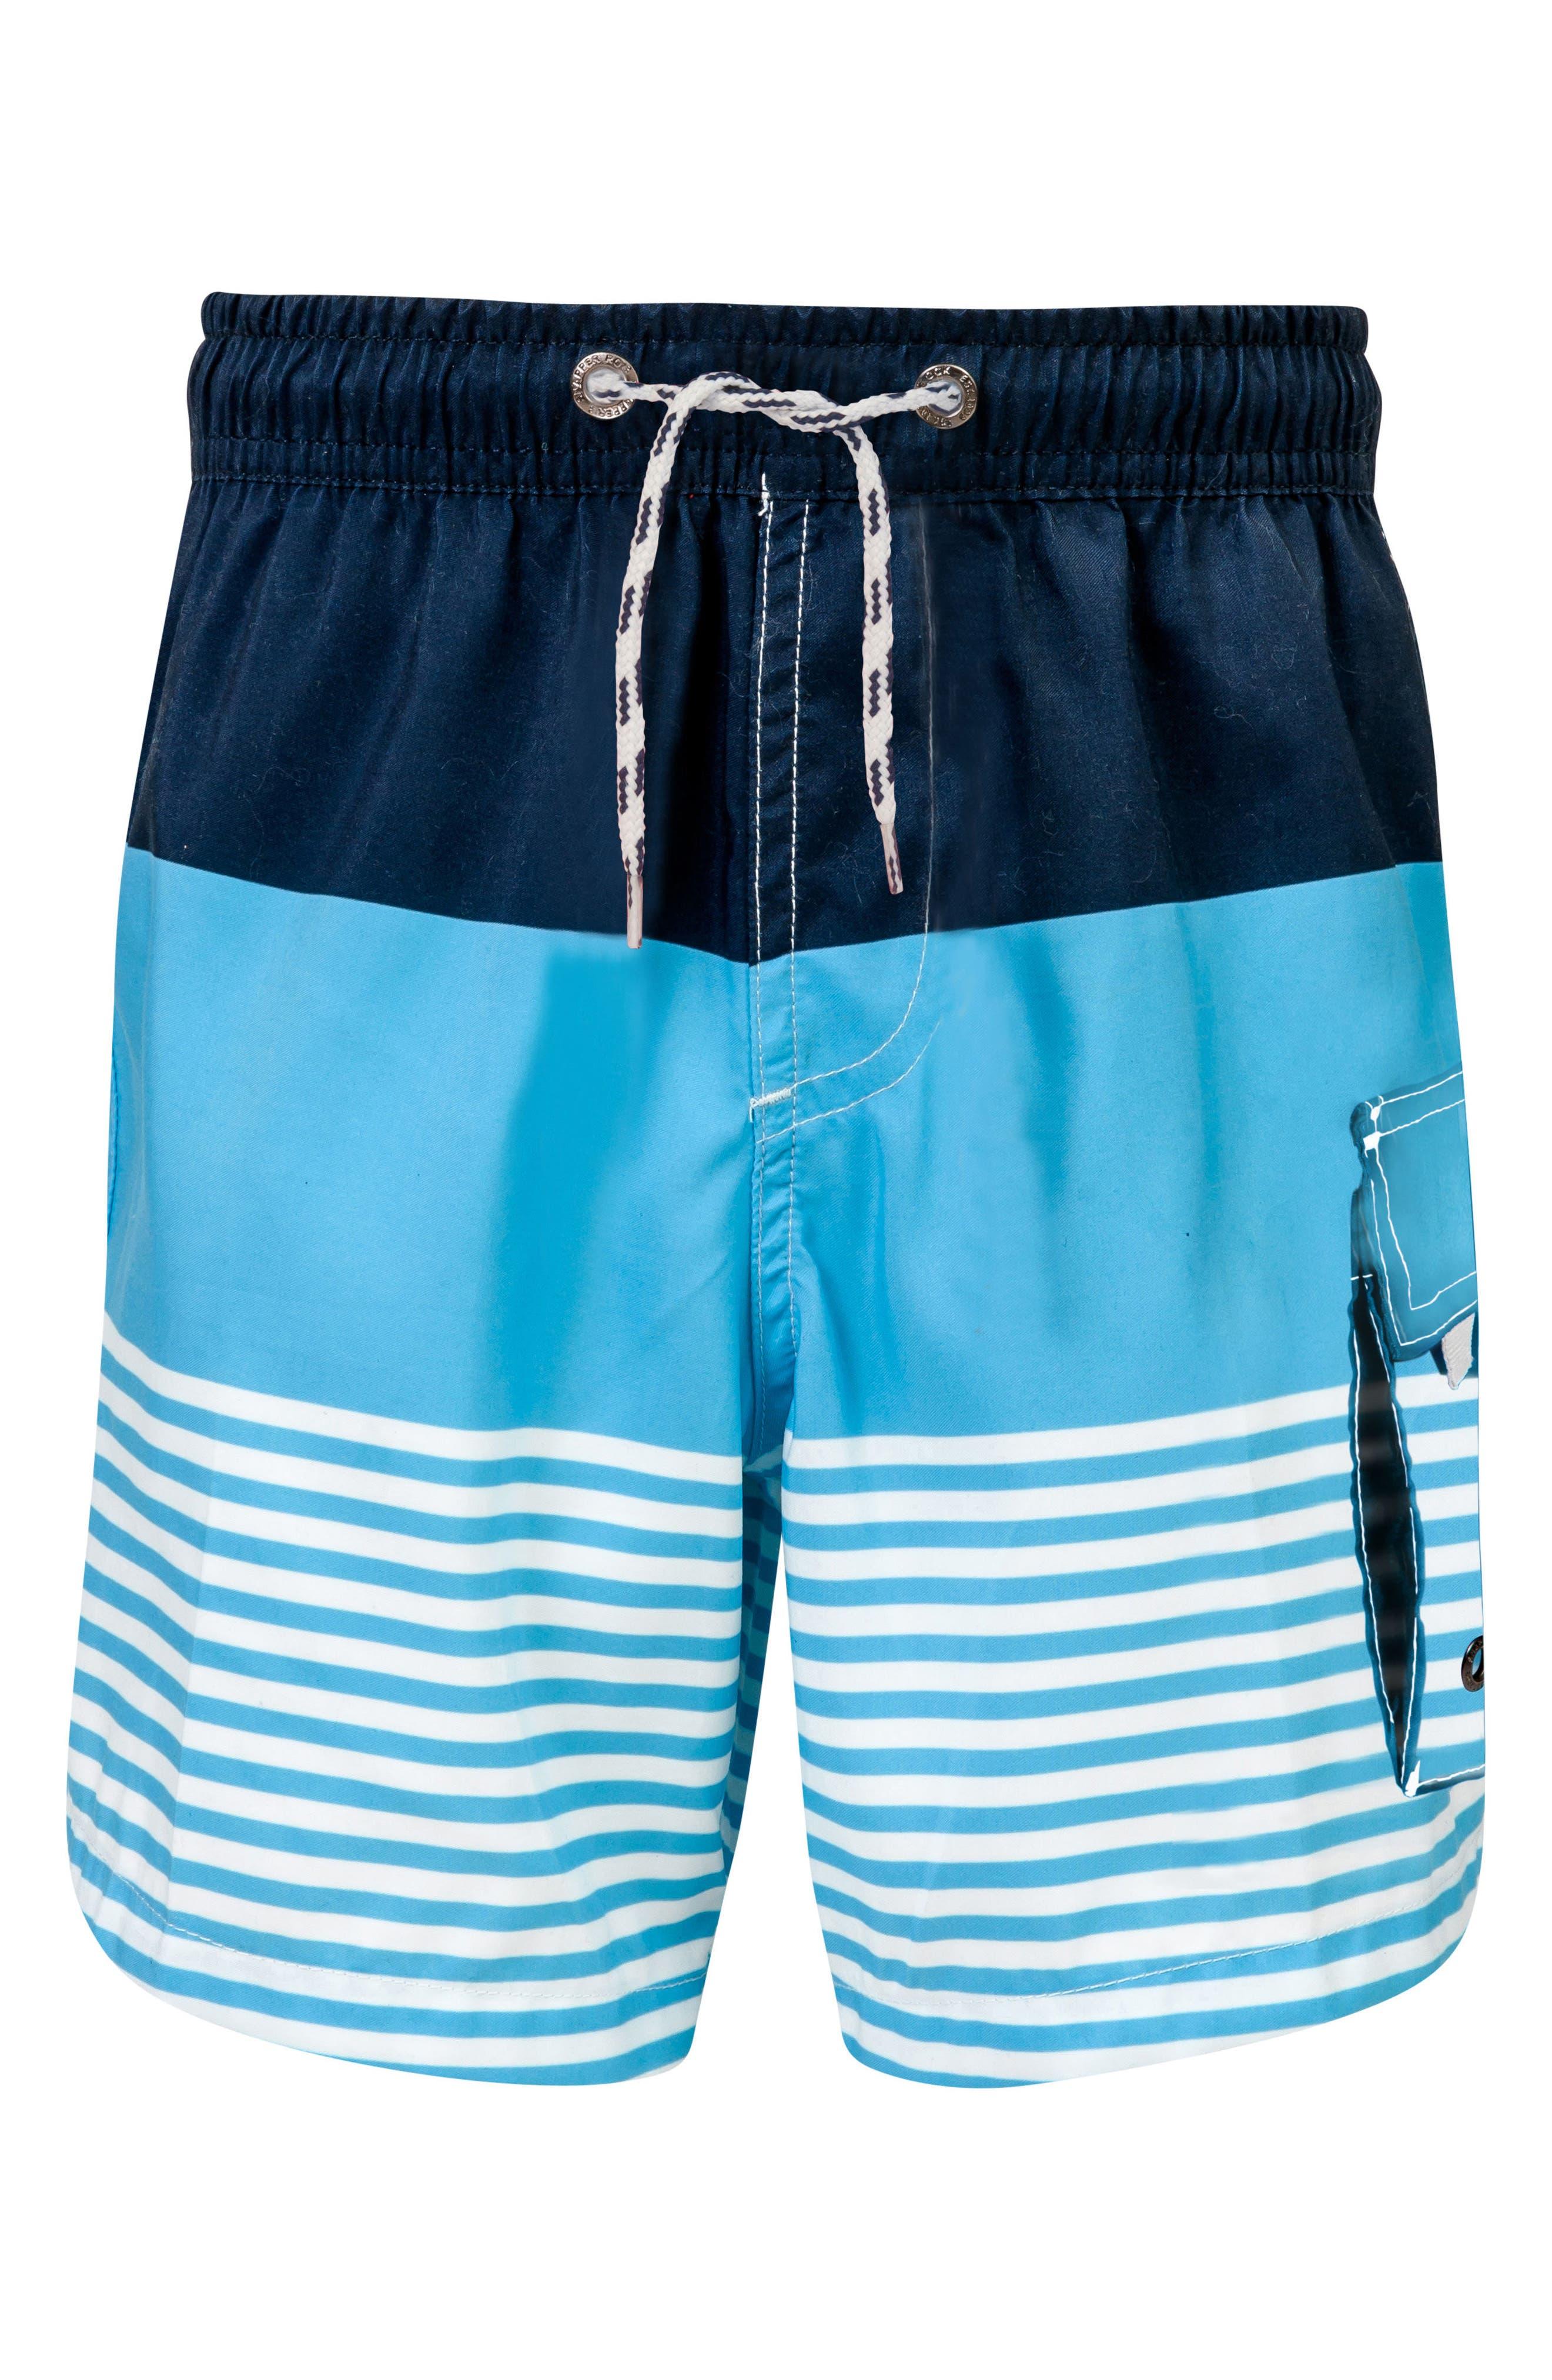 Stripe Board Shorts,                         Main,                         color, Navy/ Light Blue/ White